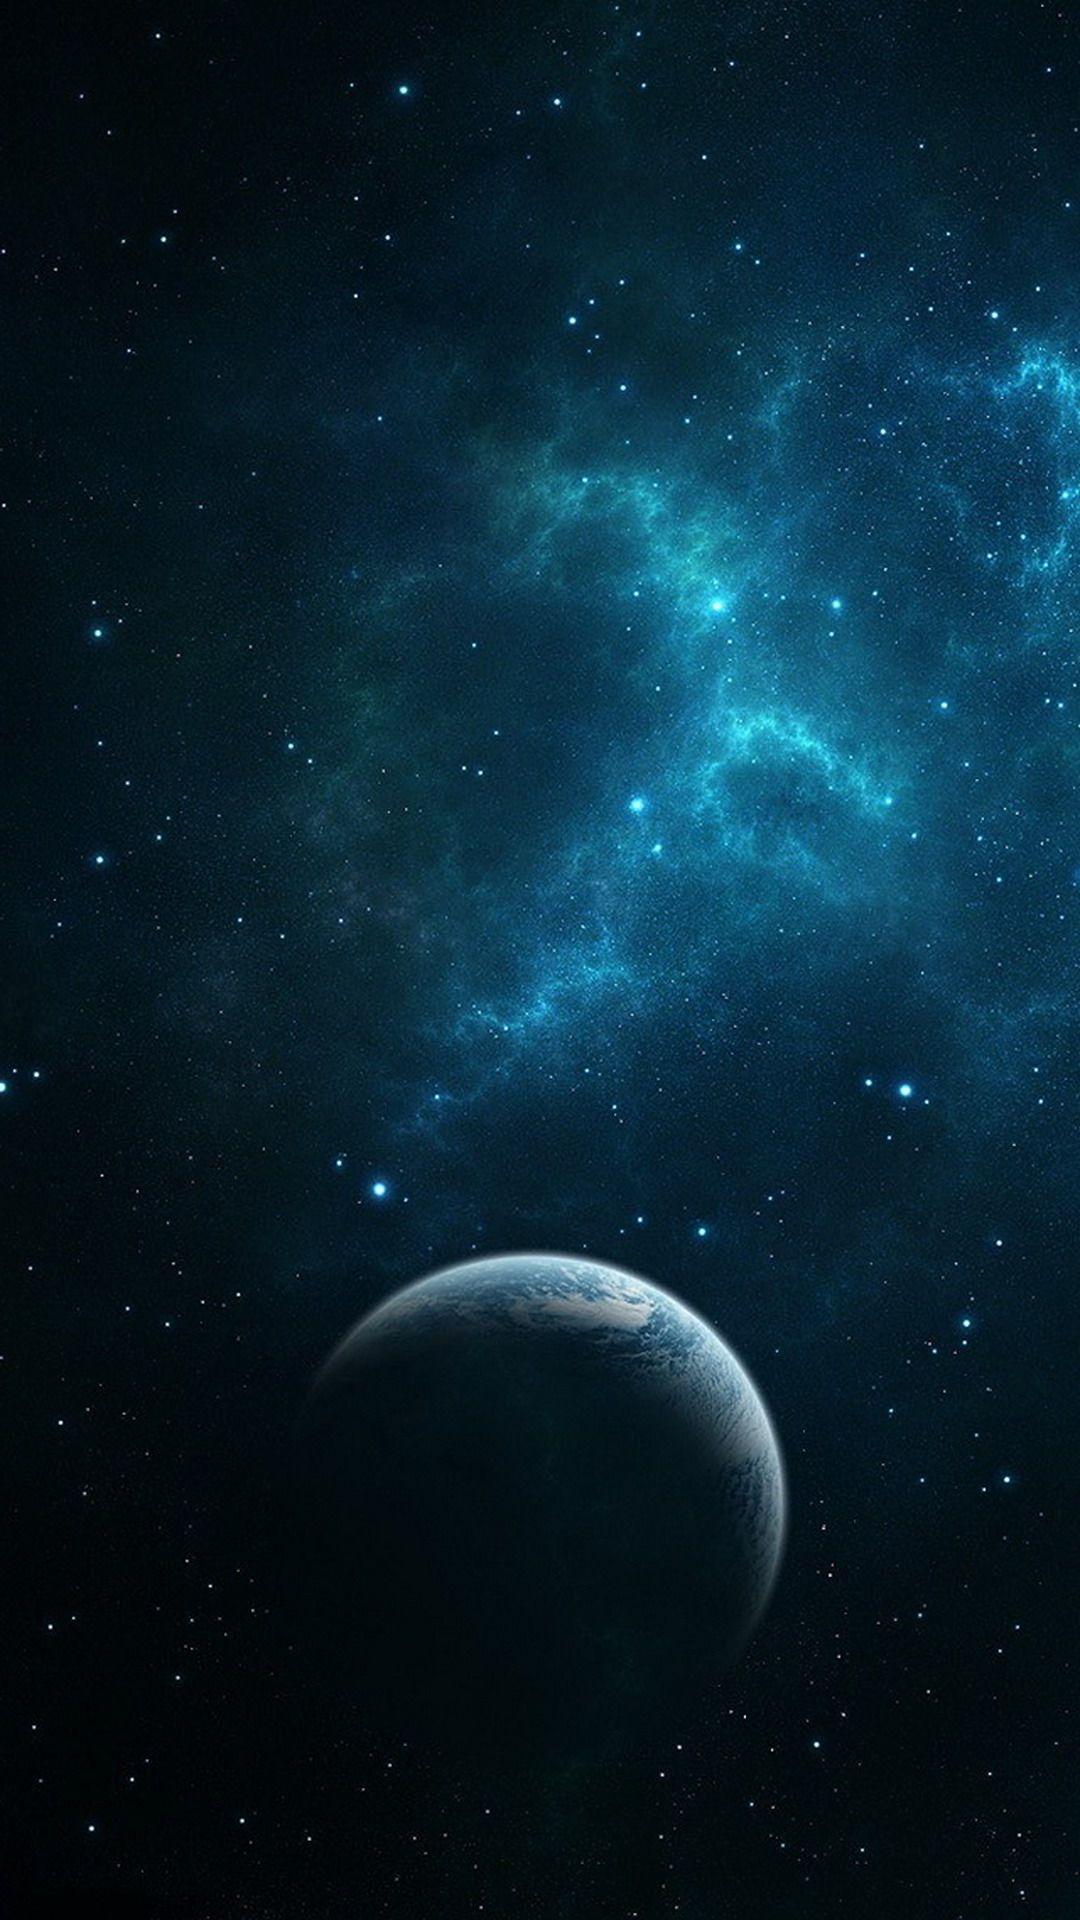 Wallpaper dark blue space galaxy s4 wallpaper 1080x1920 - Blue space galaxy wallpaper ...